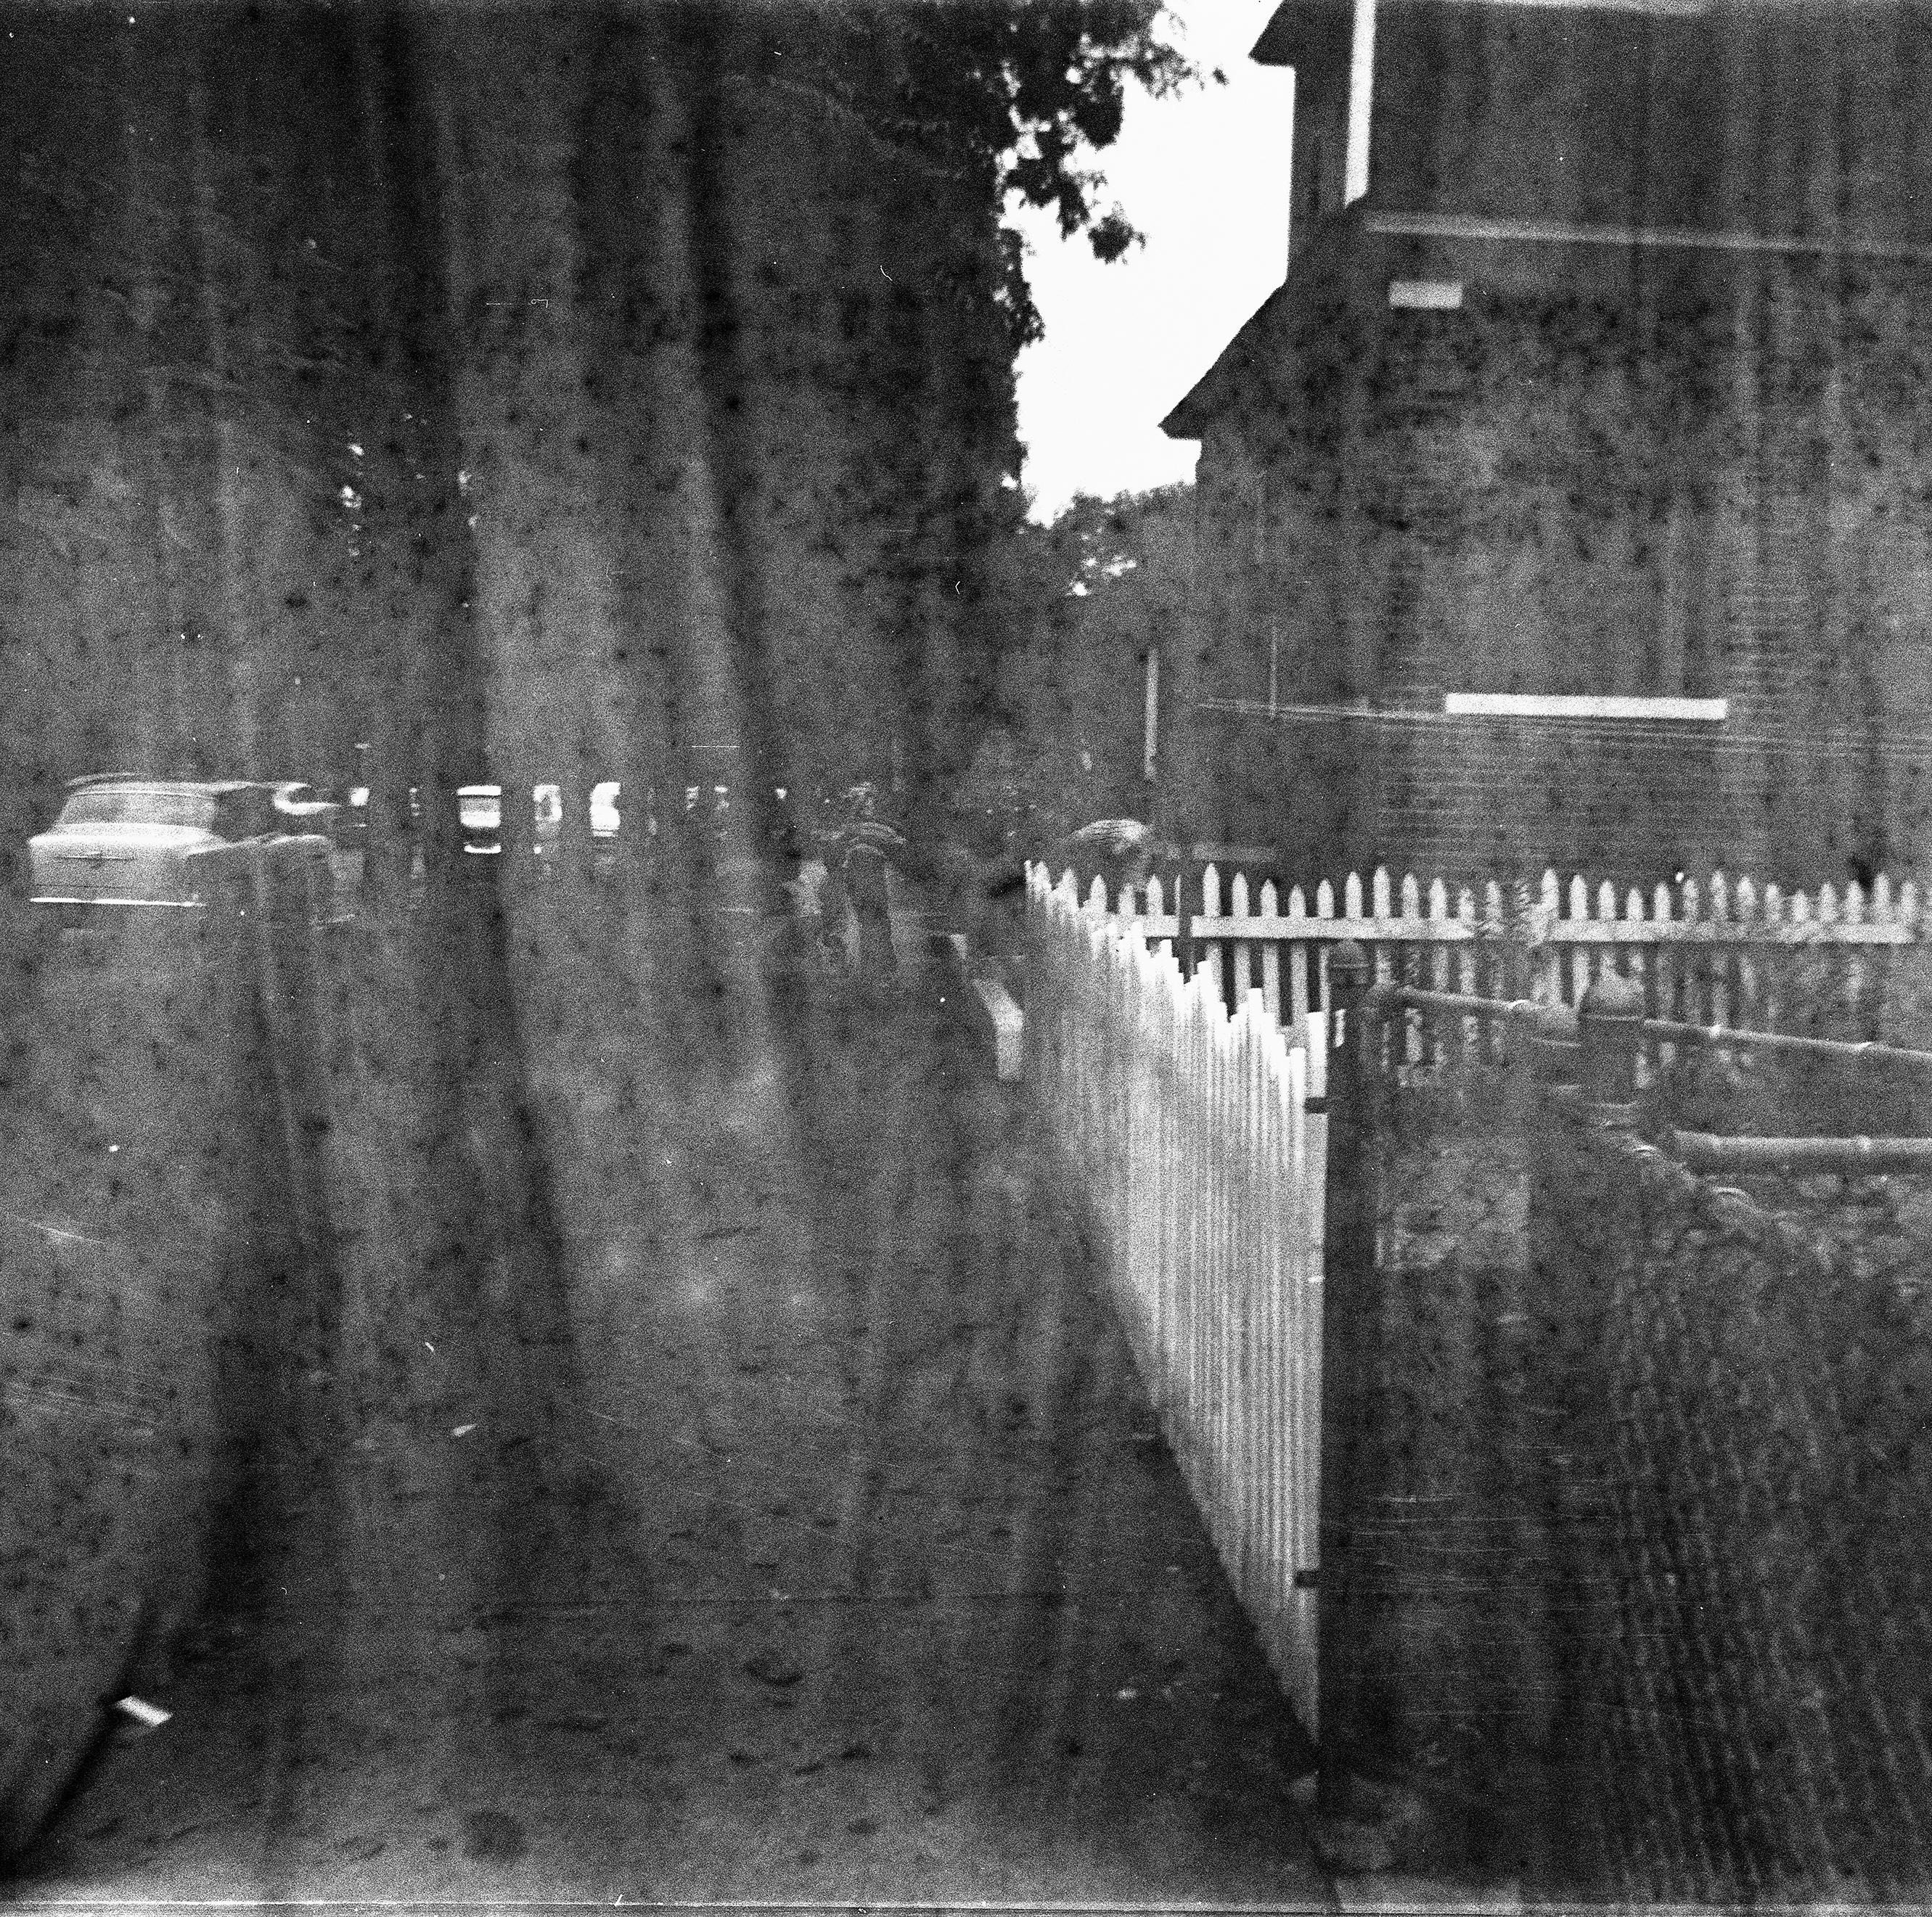 Paul Bundle 18 Roll 5 008.jpg